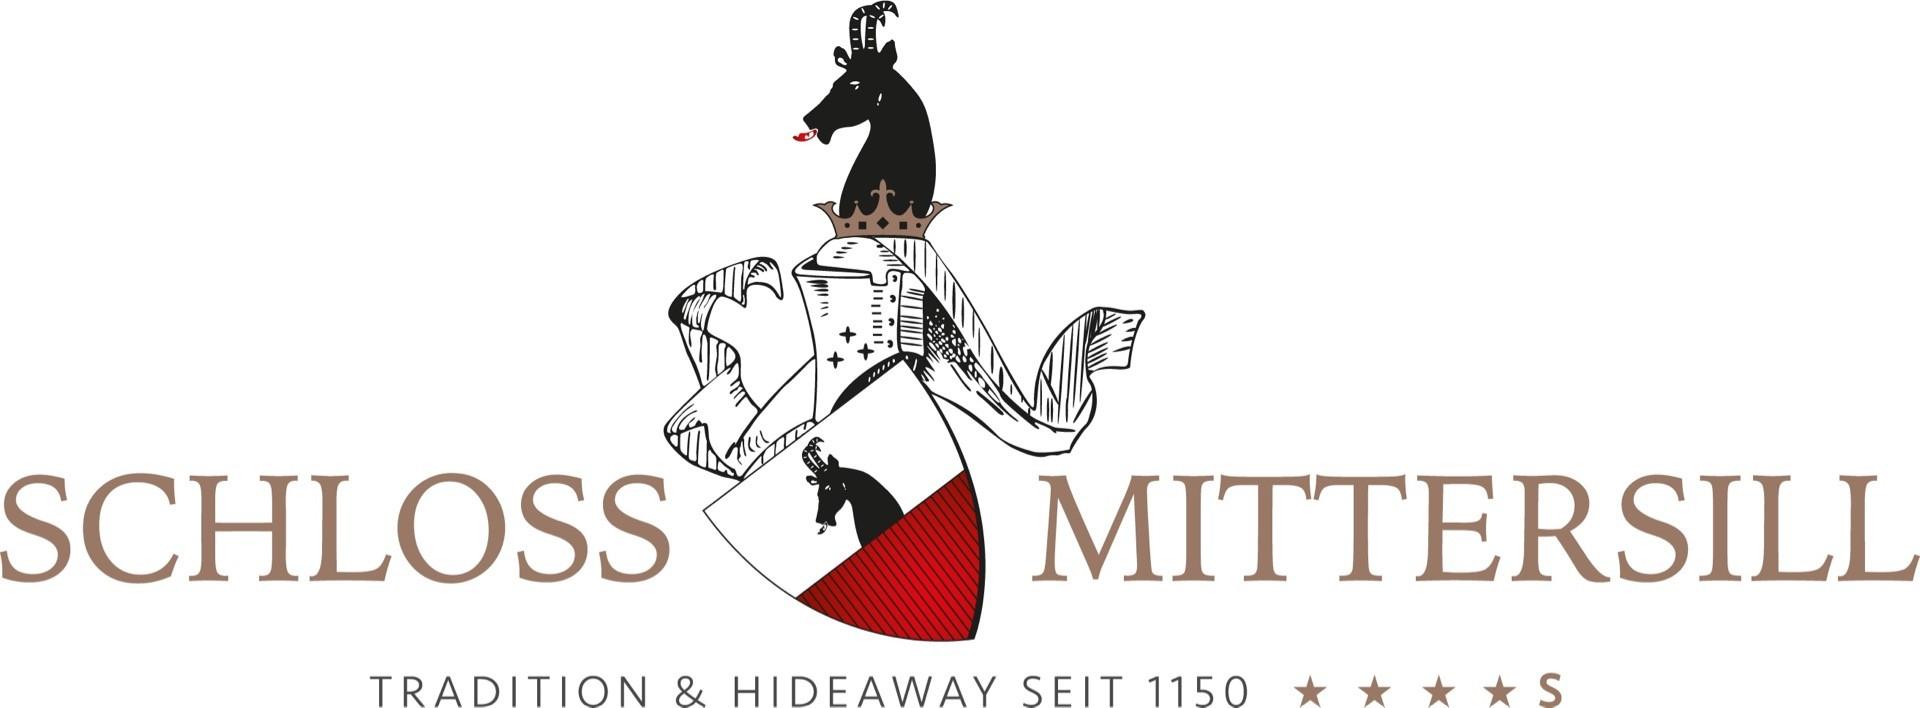 Schloss Mittersill Logo